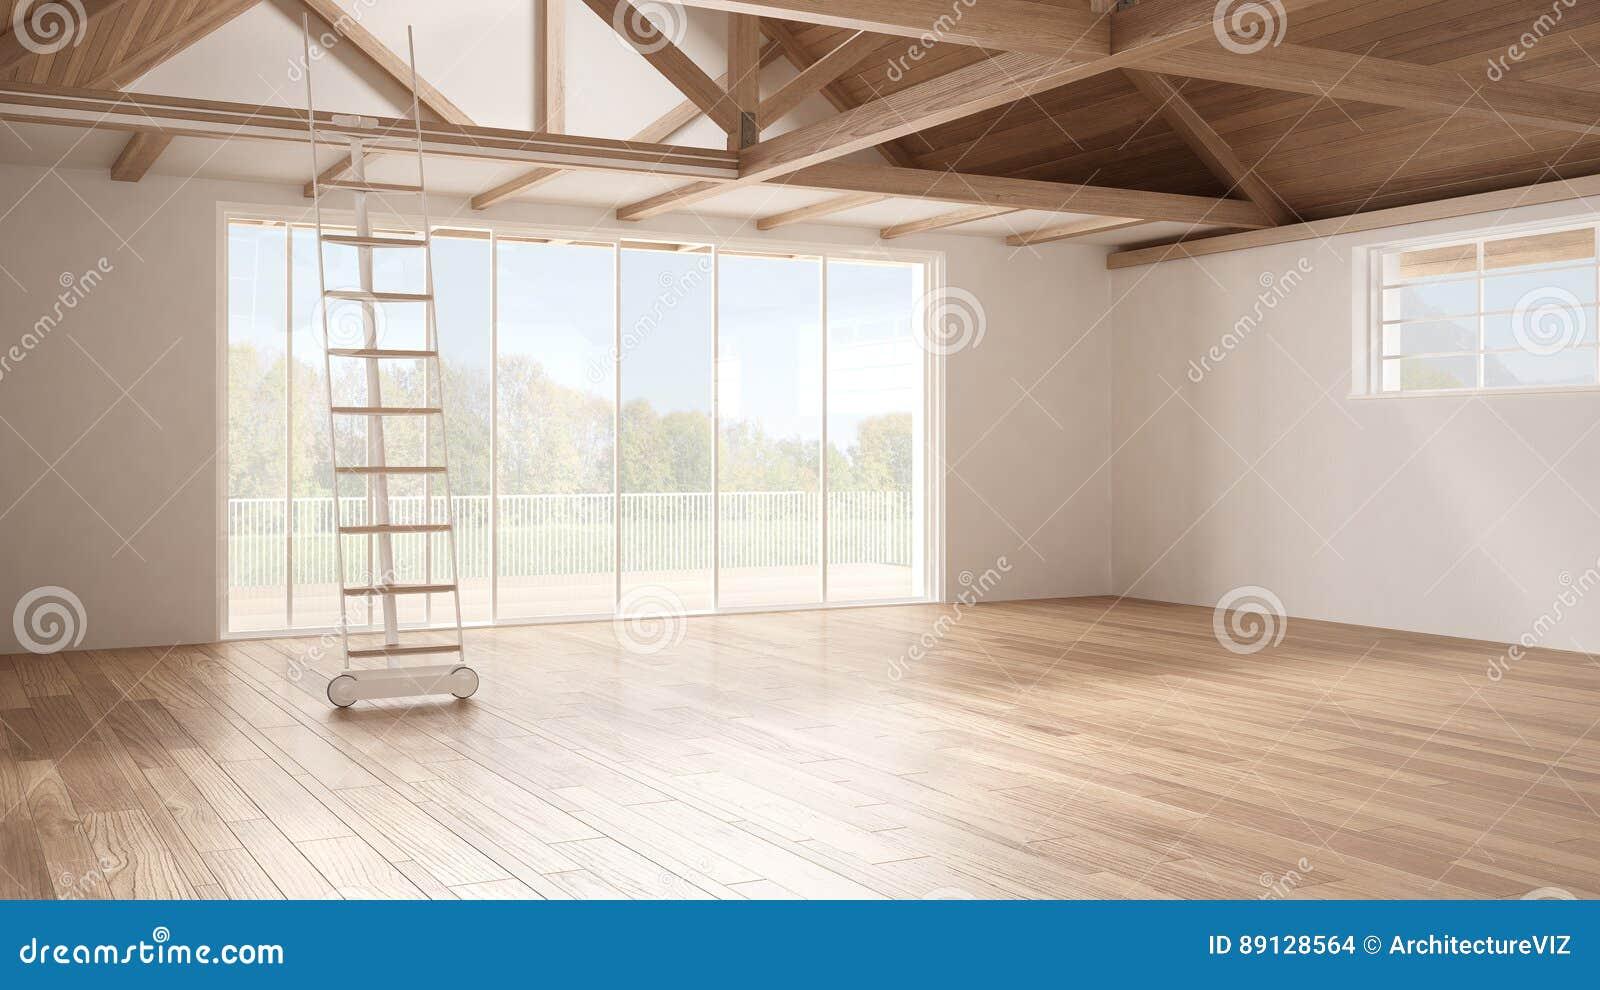 Download Minimalist Mezzanine Loft Empty Industrial Space Wooden Roofin Stock Photo